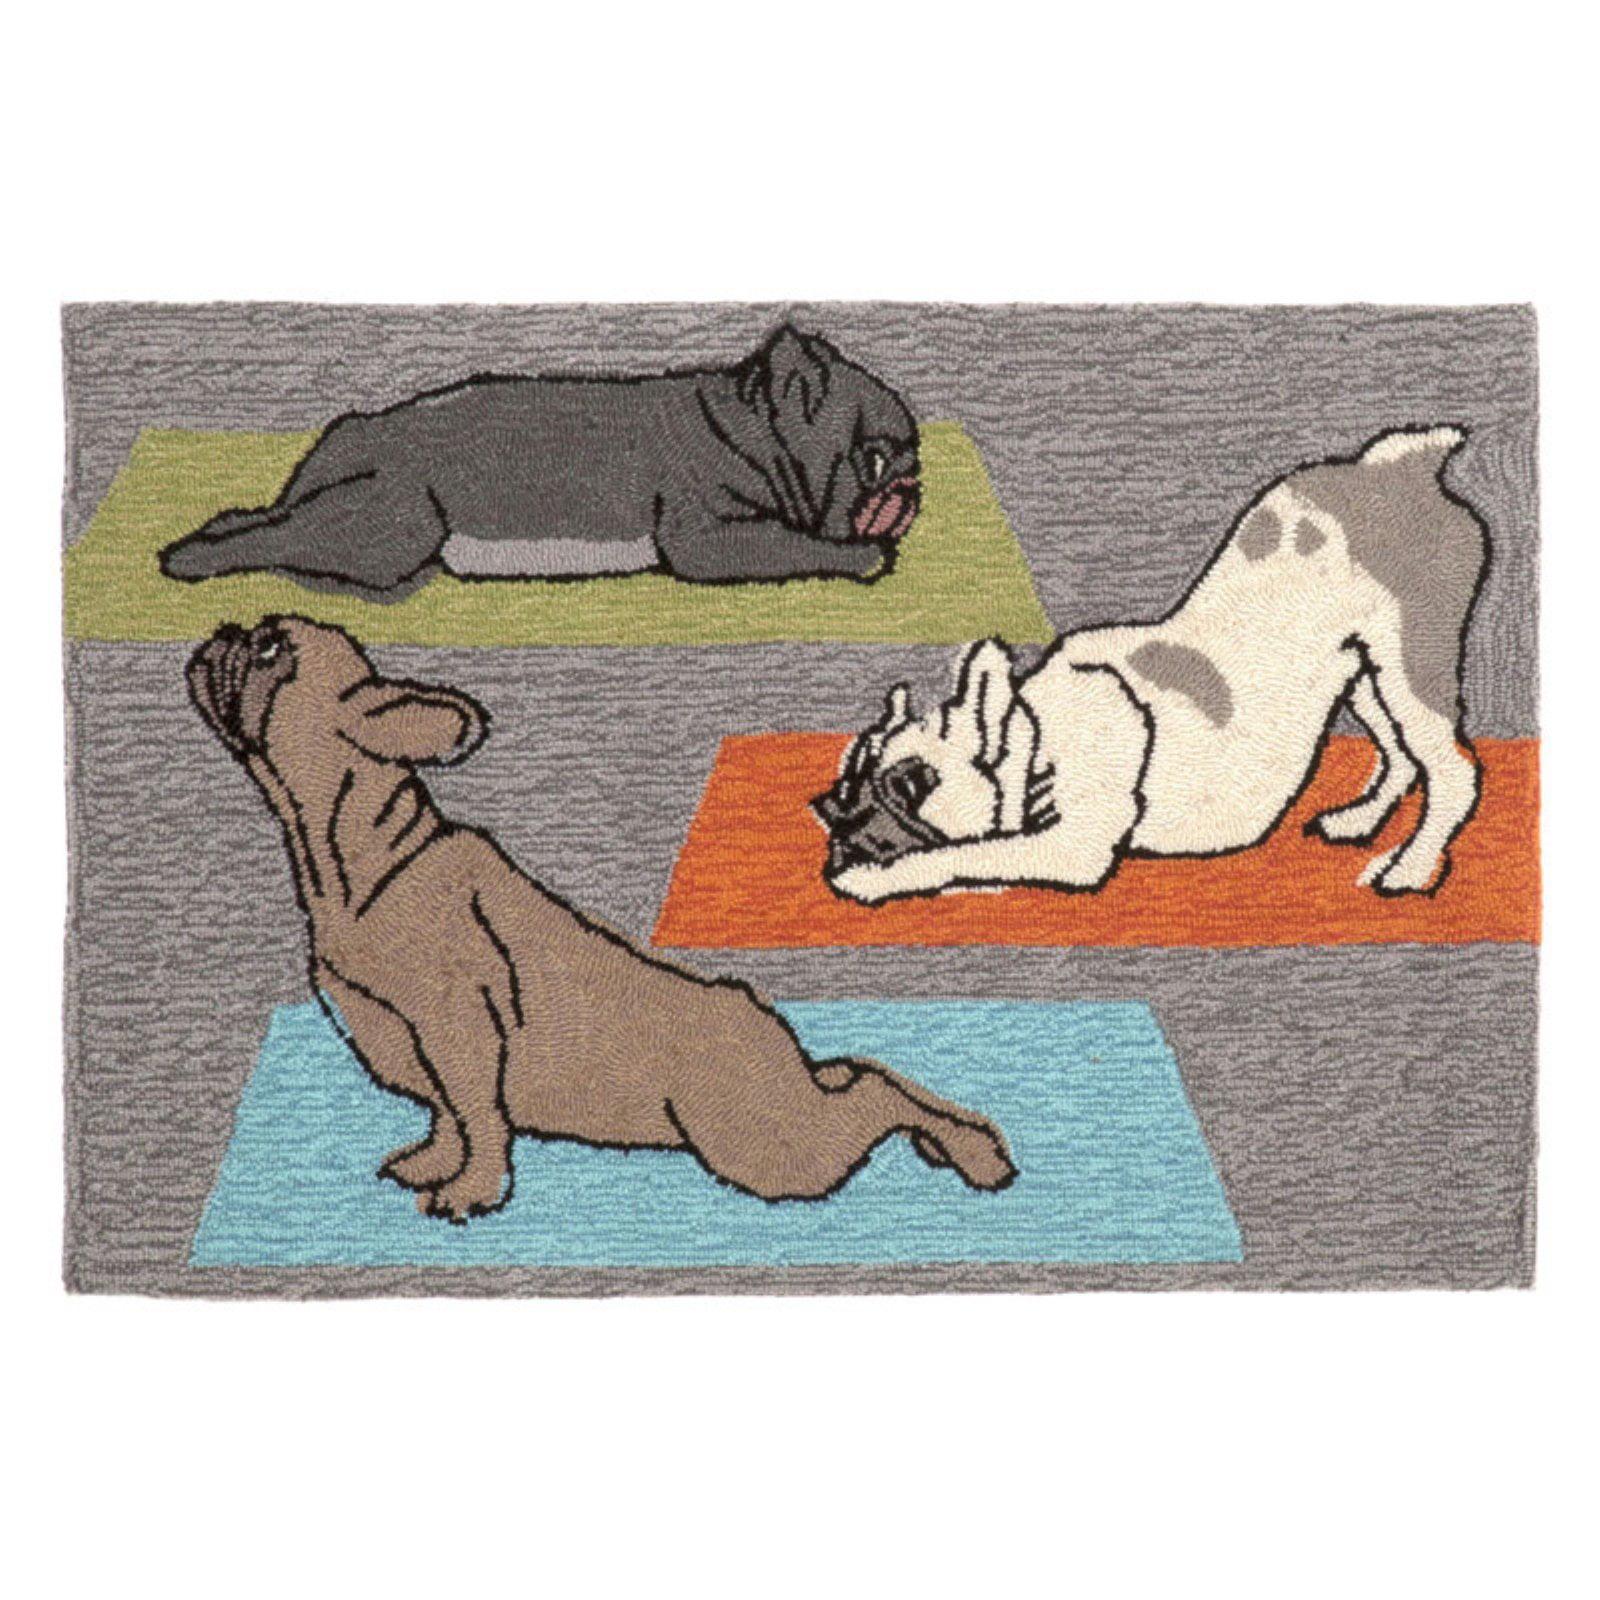 Trans-Ocean Rug Frontporch Yoga Dogs Doormat